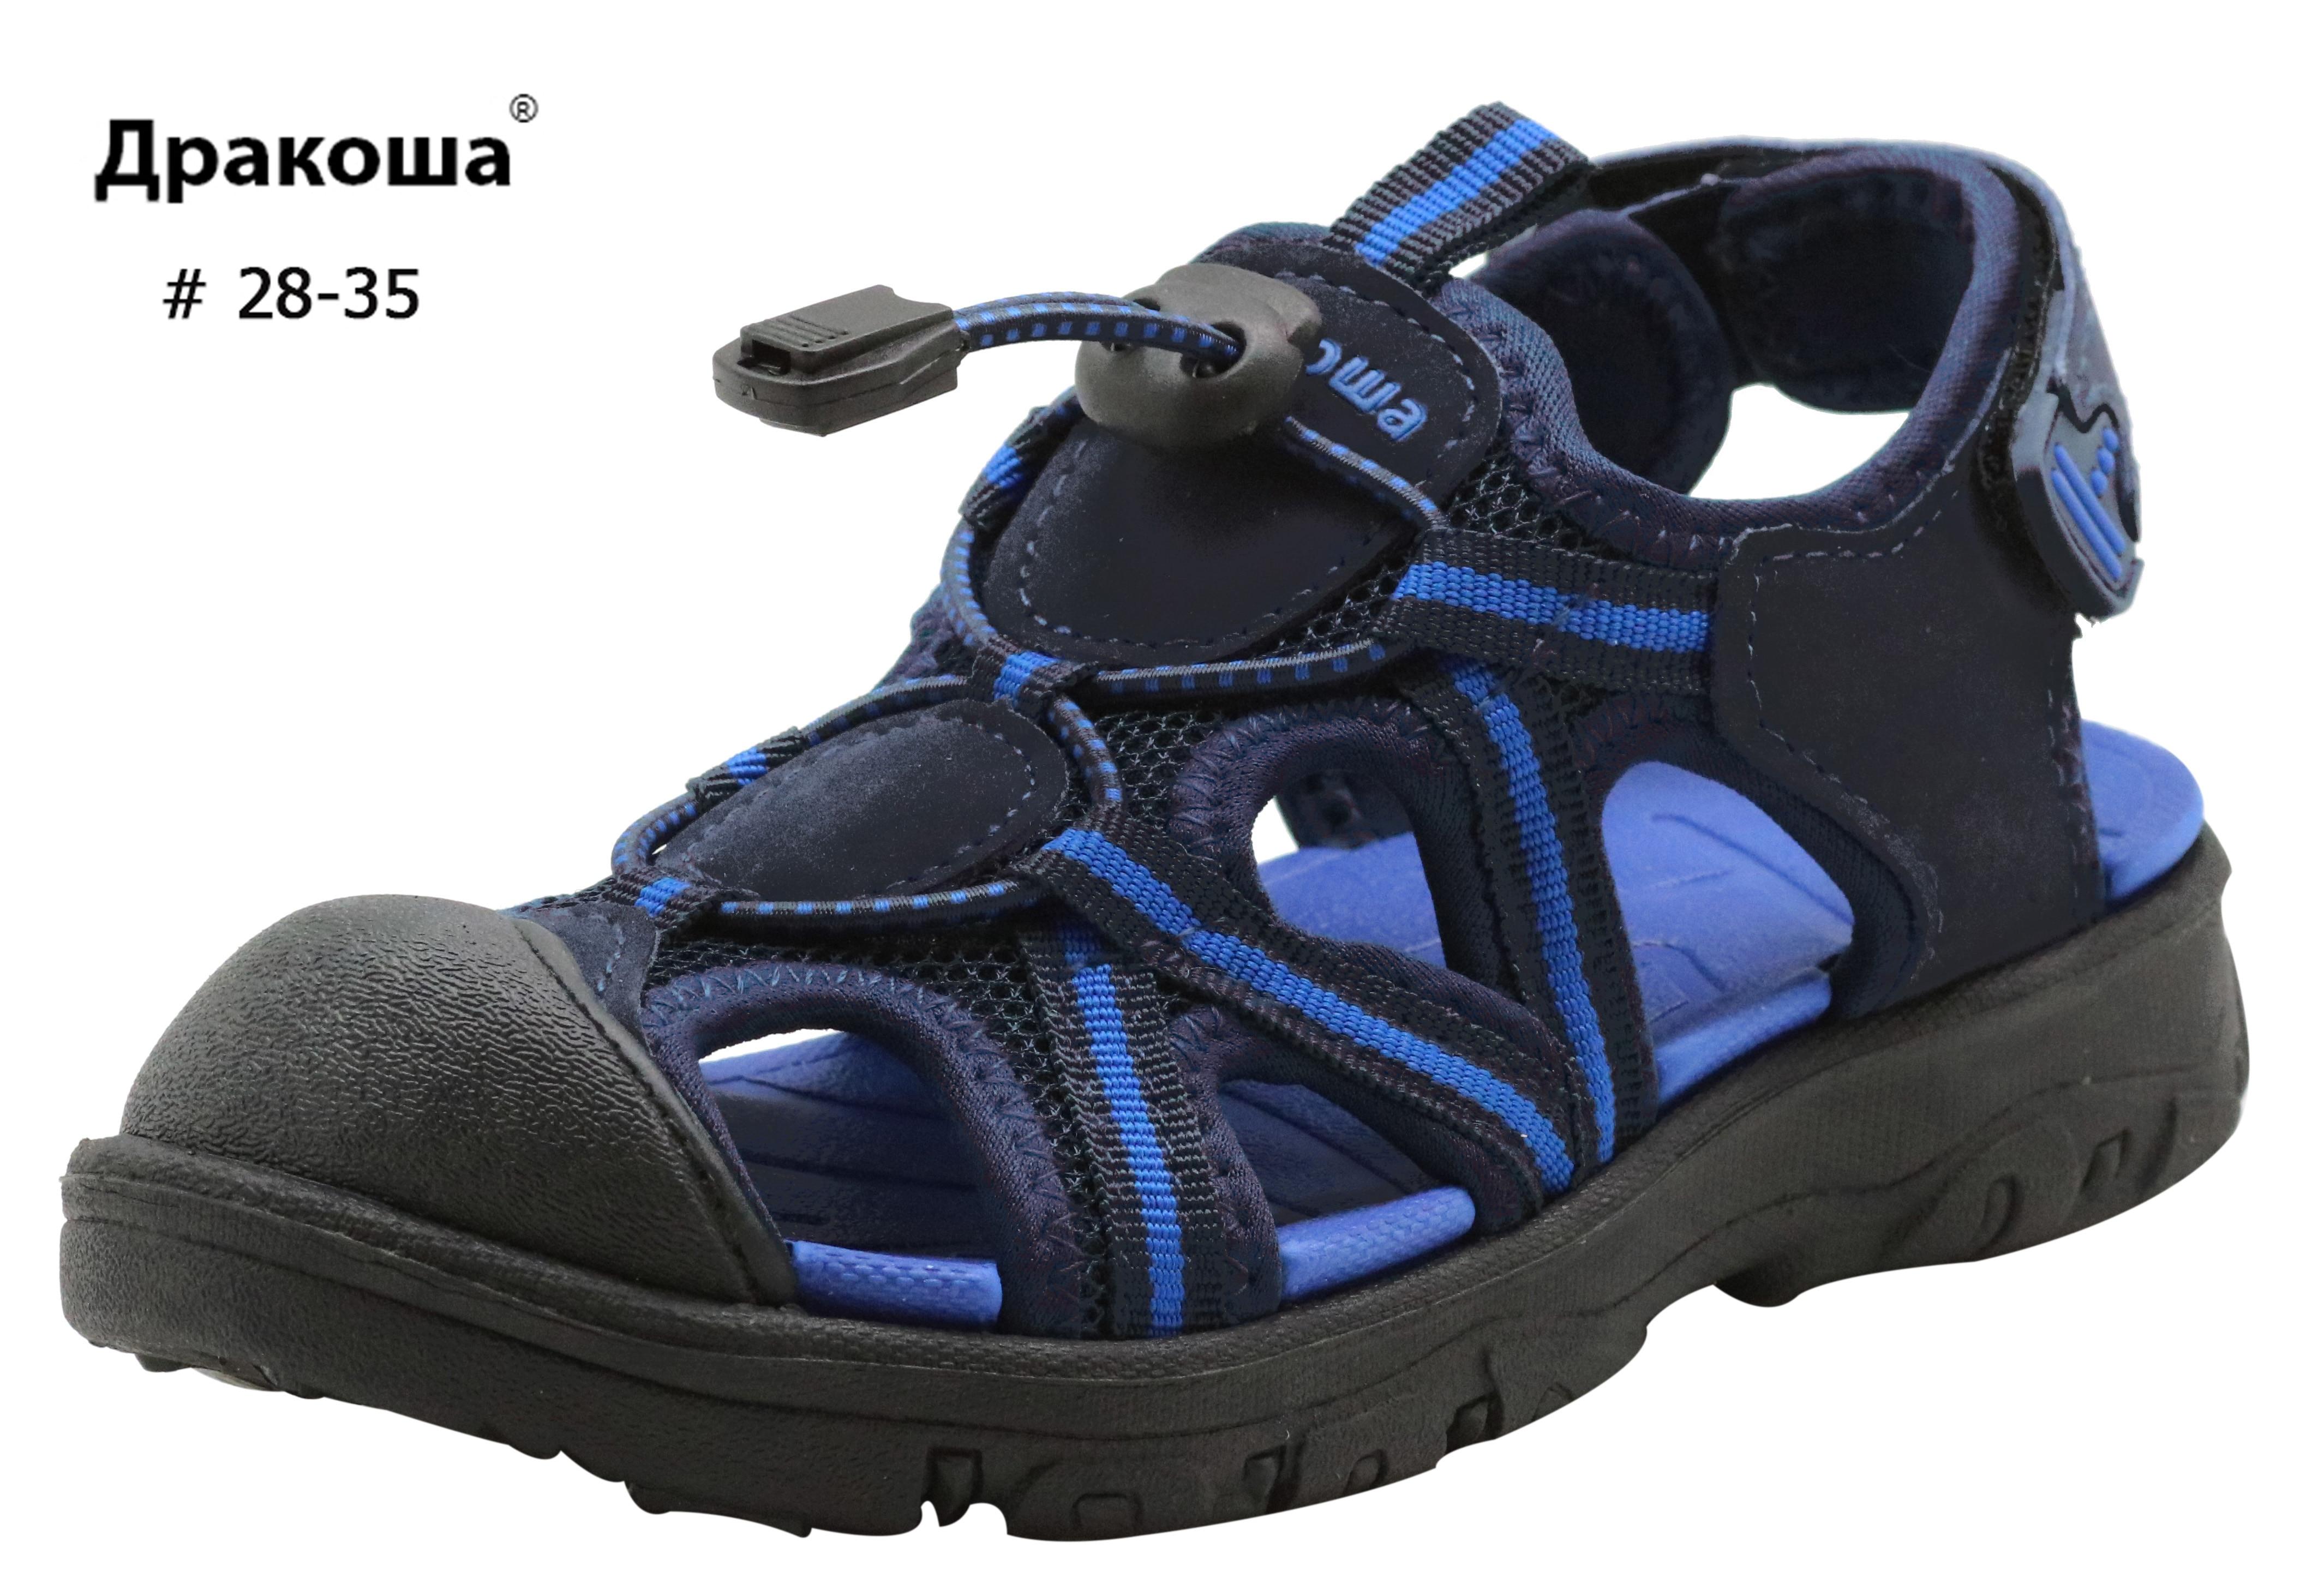 Apakowa Ankle Unisex Kids Boys Sandals Hollow Breathable Toddler Sandals Hook&Loop Sport Summer Girl Sandals Children's Shoes